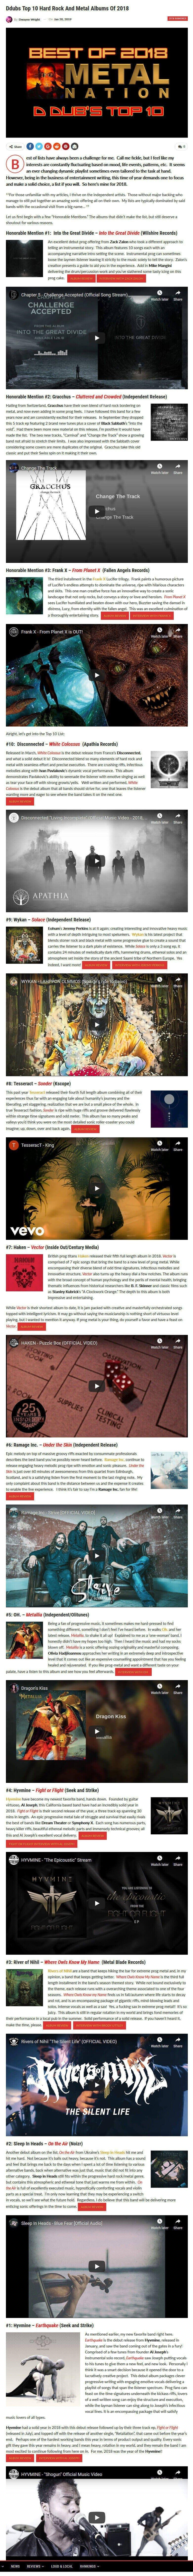 https://metalnation.com/ddubs-top-10-hard-rock-and-metal-albums-of-2018/